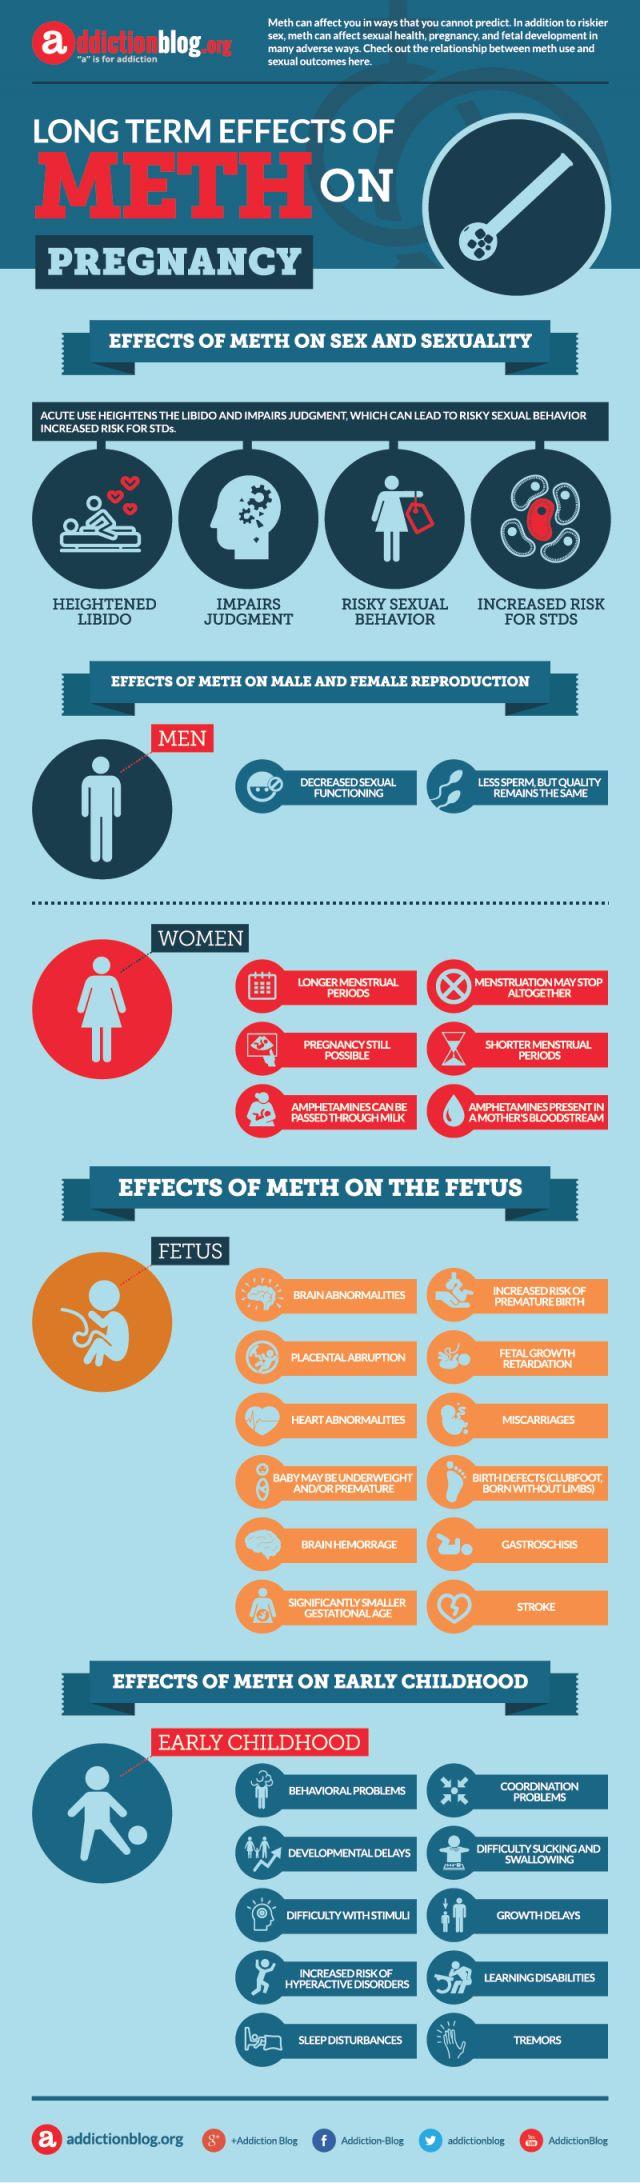 Famciclovir Side Effects Pregnancy